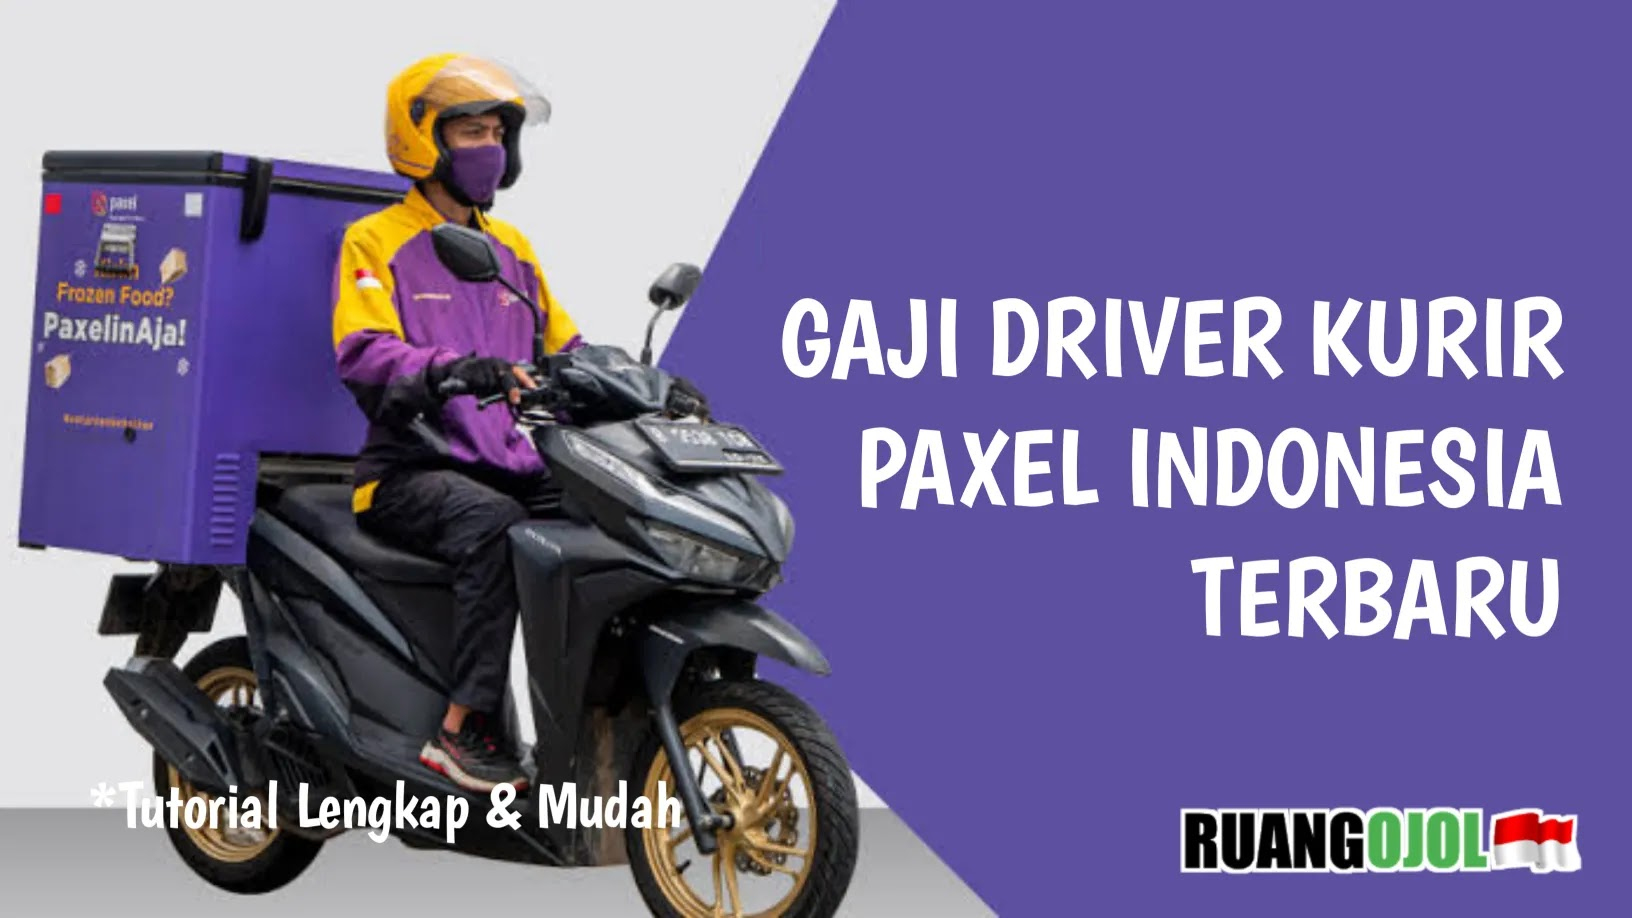 Gaji Driver Kurir Paxel Indonesia Terbaru